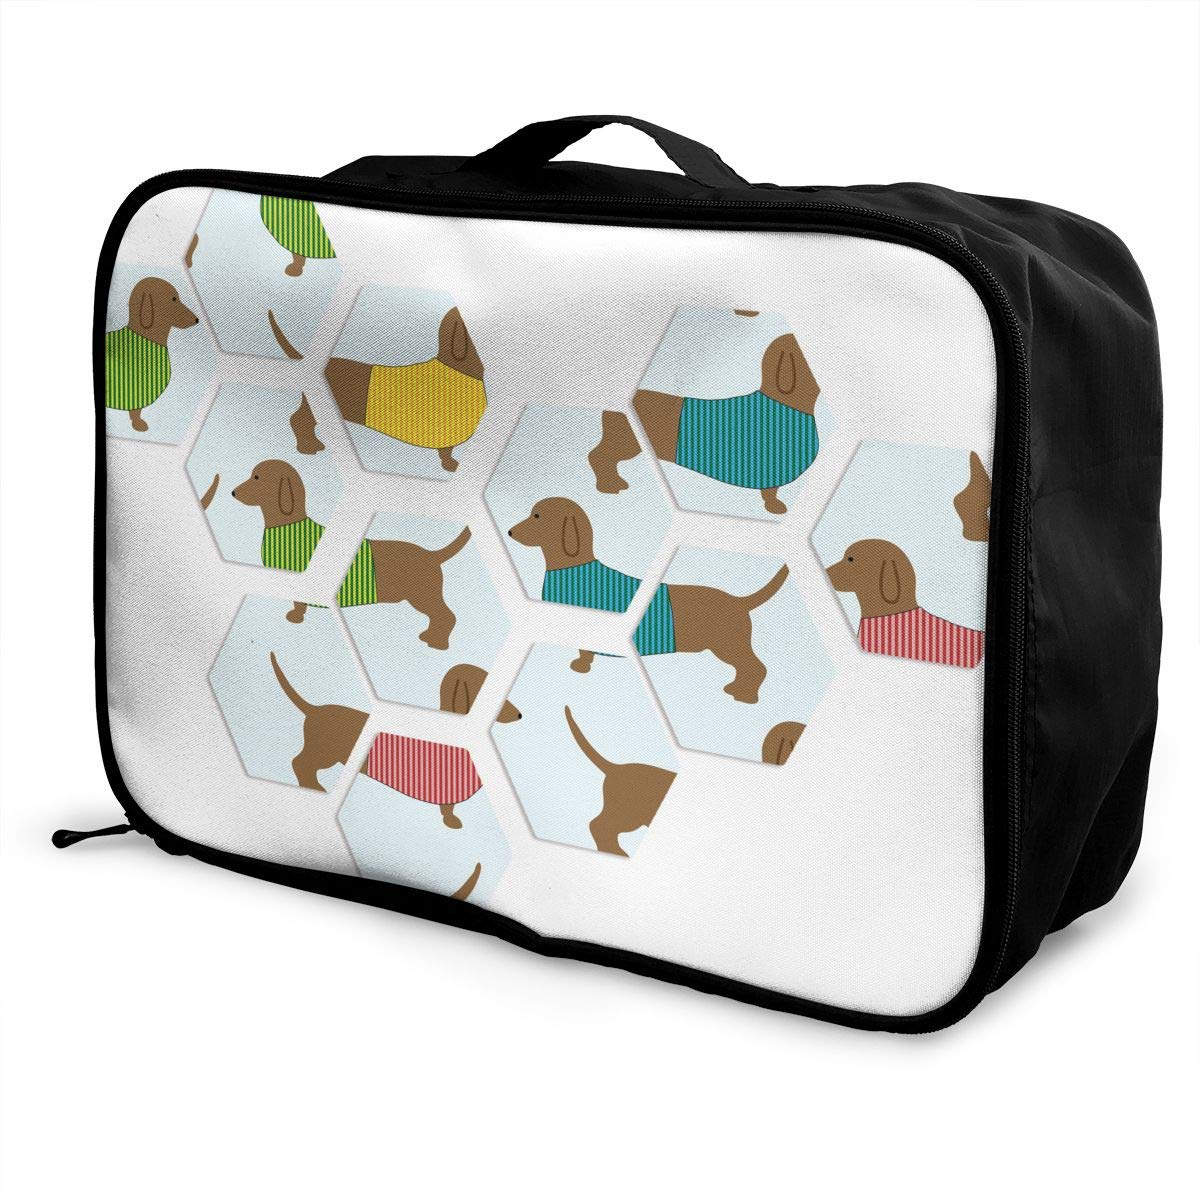 ADGAI Dog Puzzle Canvas Travel Weekender Bag,Fashion Custom Lightweight Large Capacity Portable Luggage Bag,Suitcase Trolley Bag